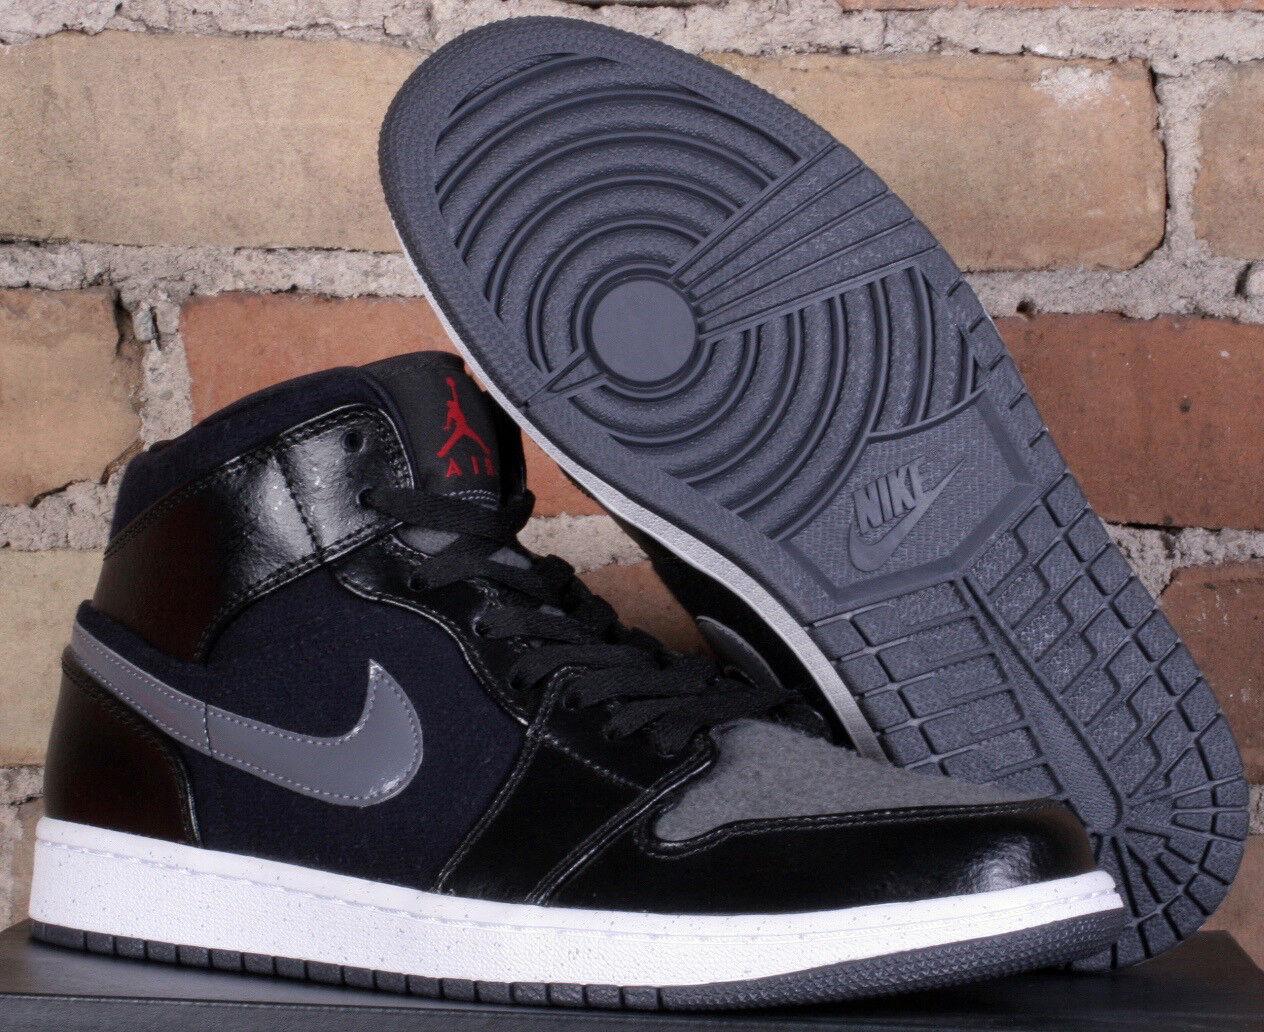 size 40 3d5e6 6579b Nike Air Jordan 1 Mid Premium Noir   Gris Basketball Chaussures 852542 001